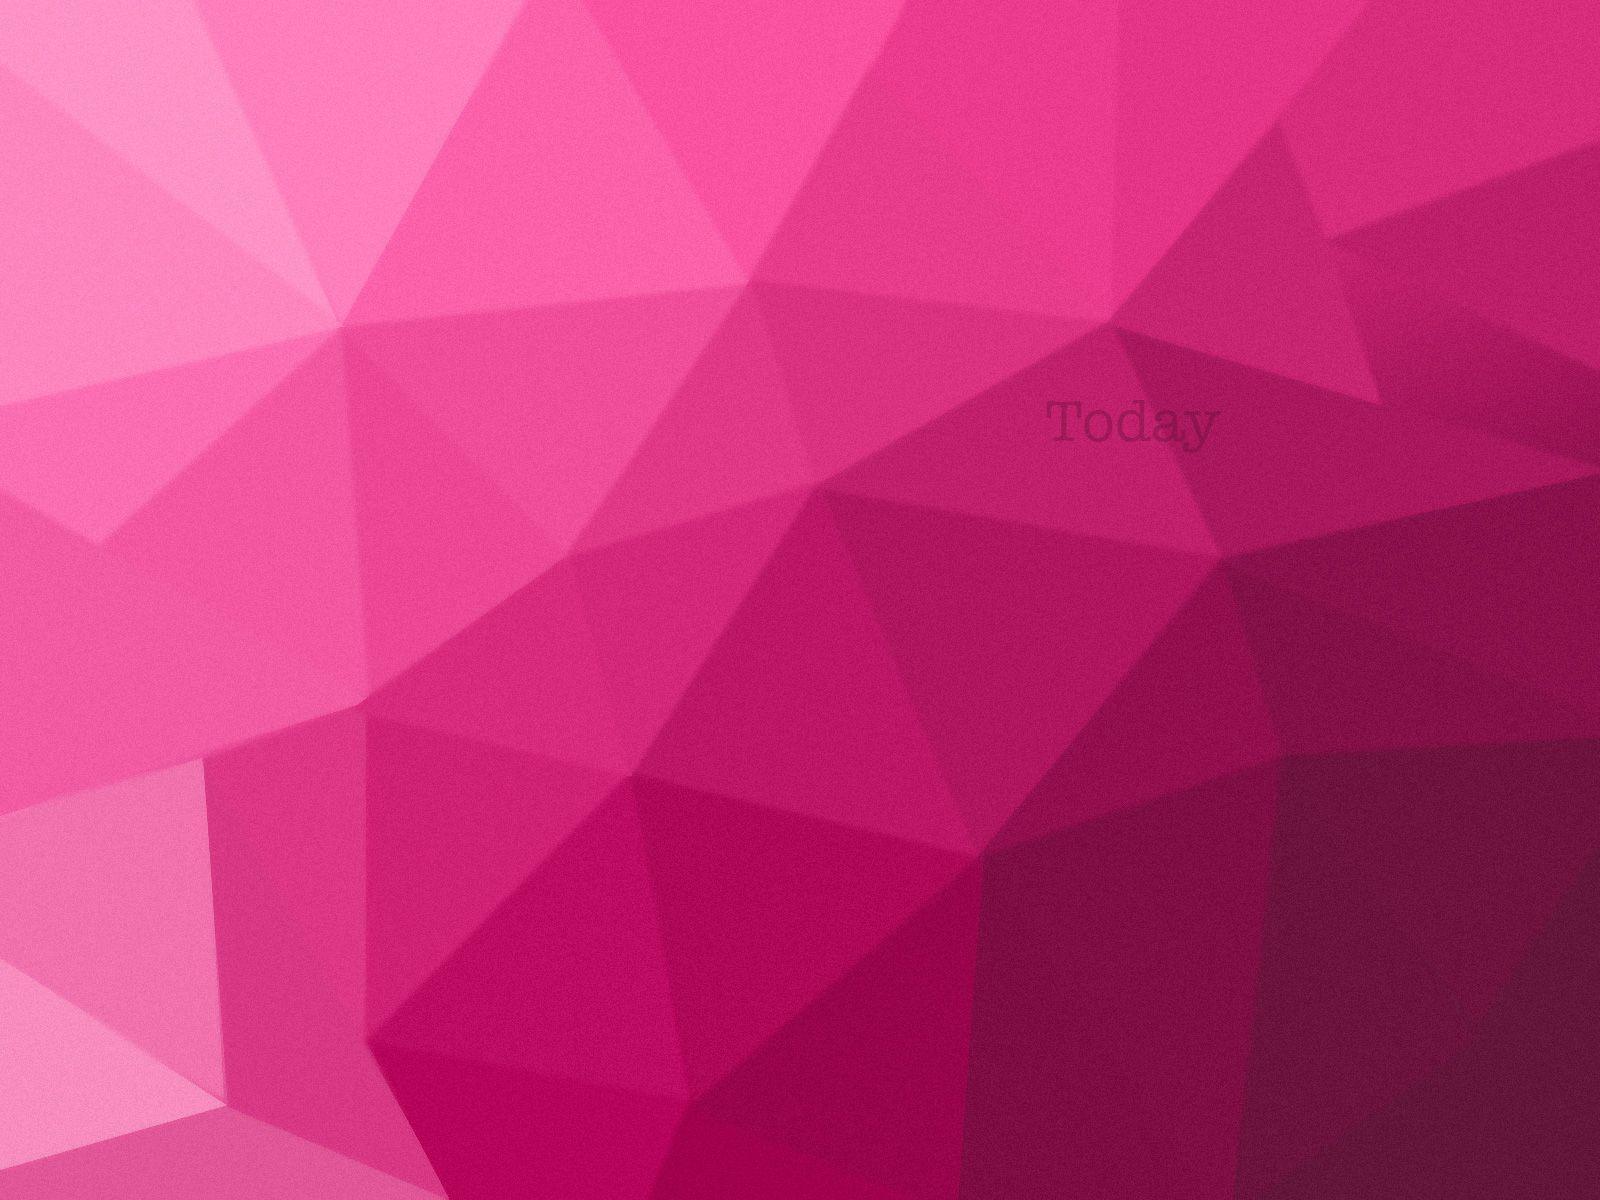 Pink Geometric Wallpapers Top Free Pink Geometric